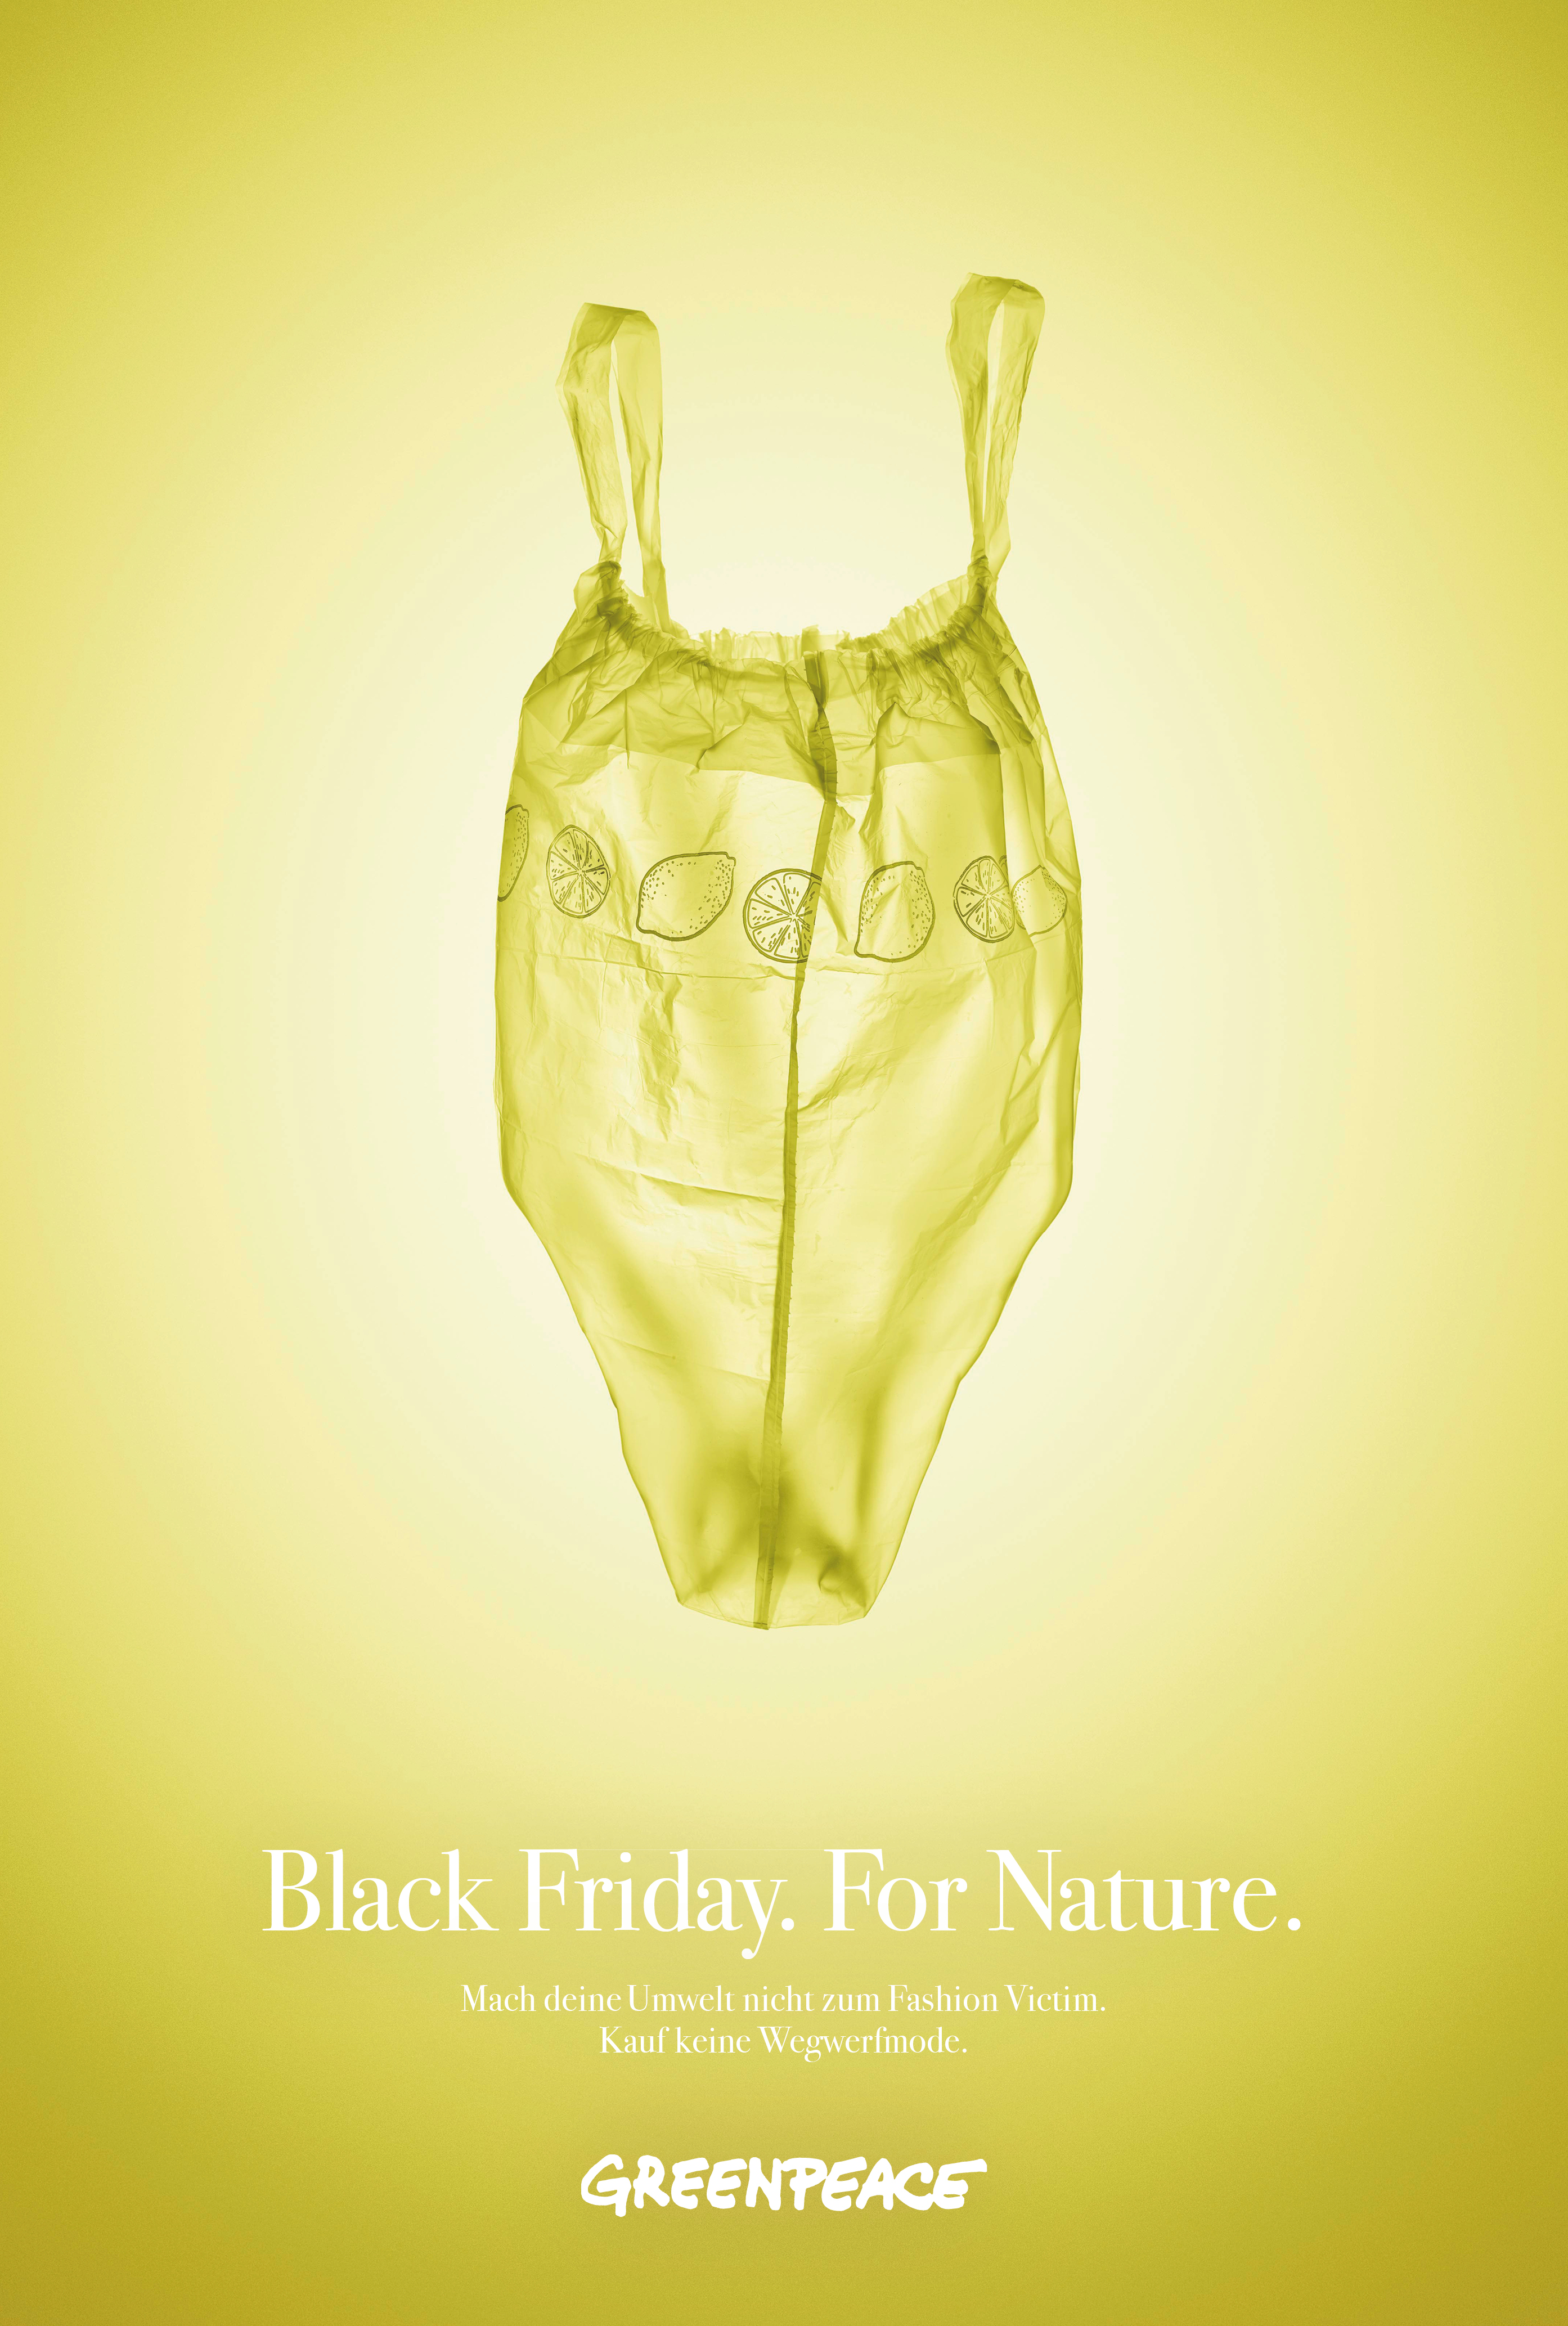 Greenpeace_Fashion_Citylight_LO9_body